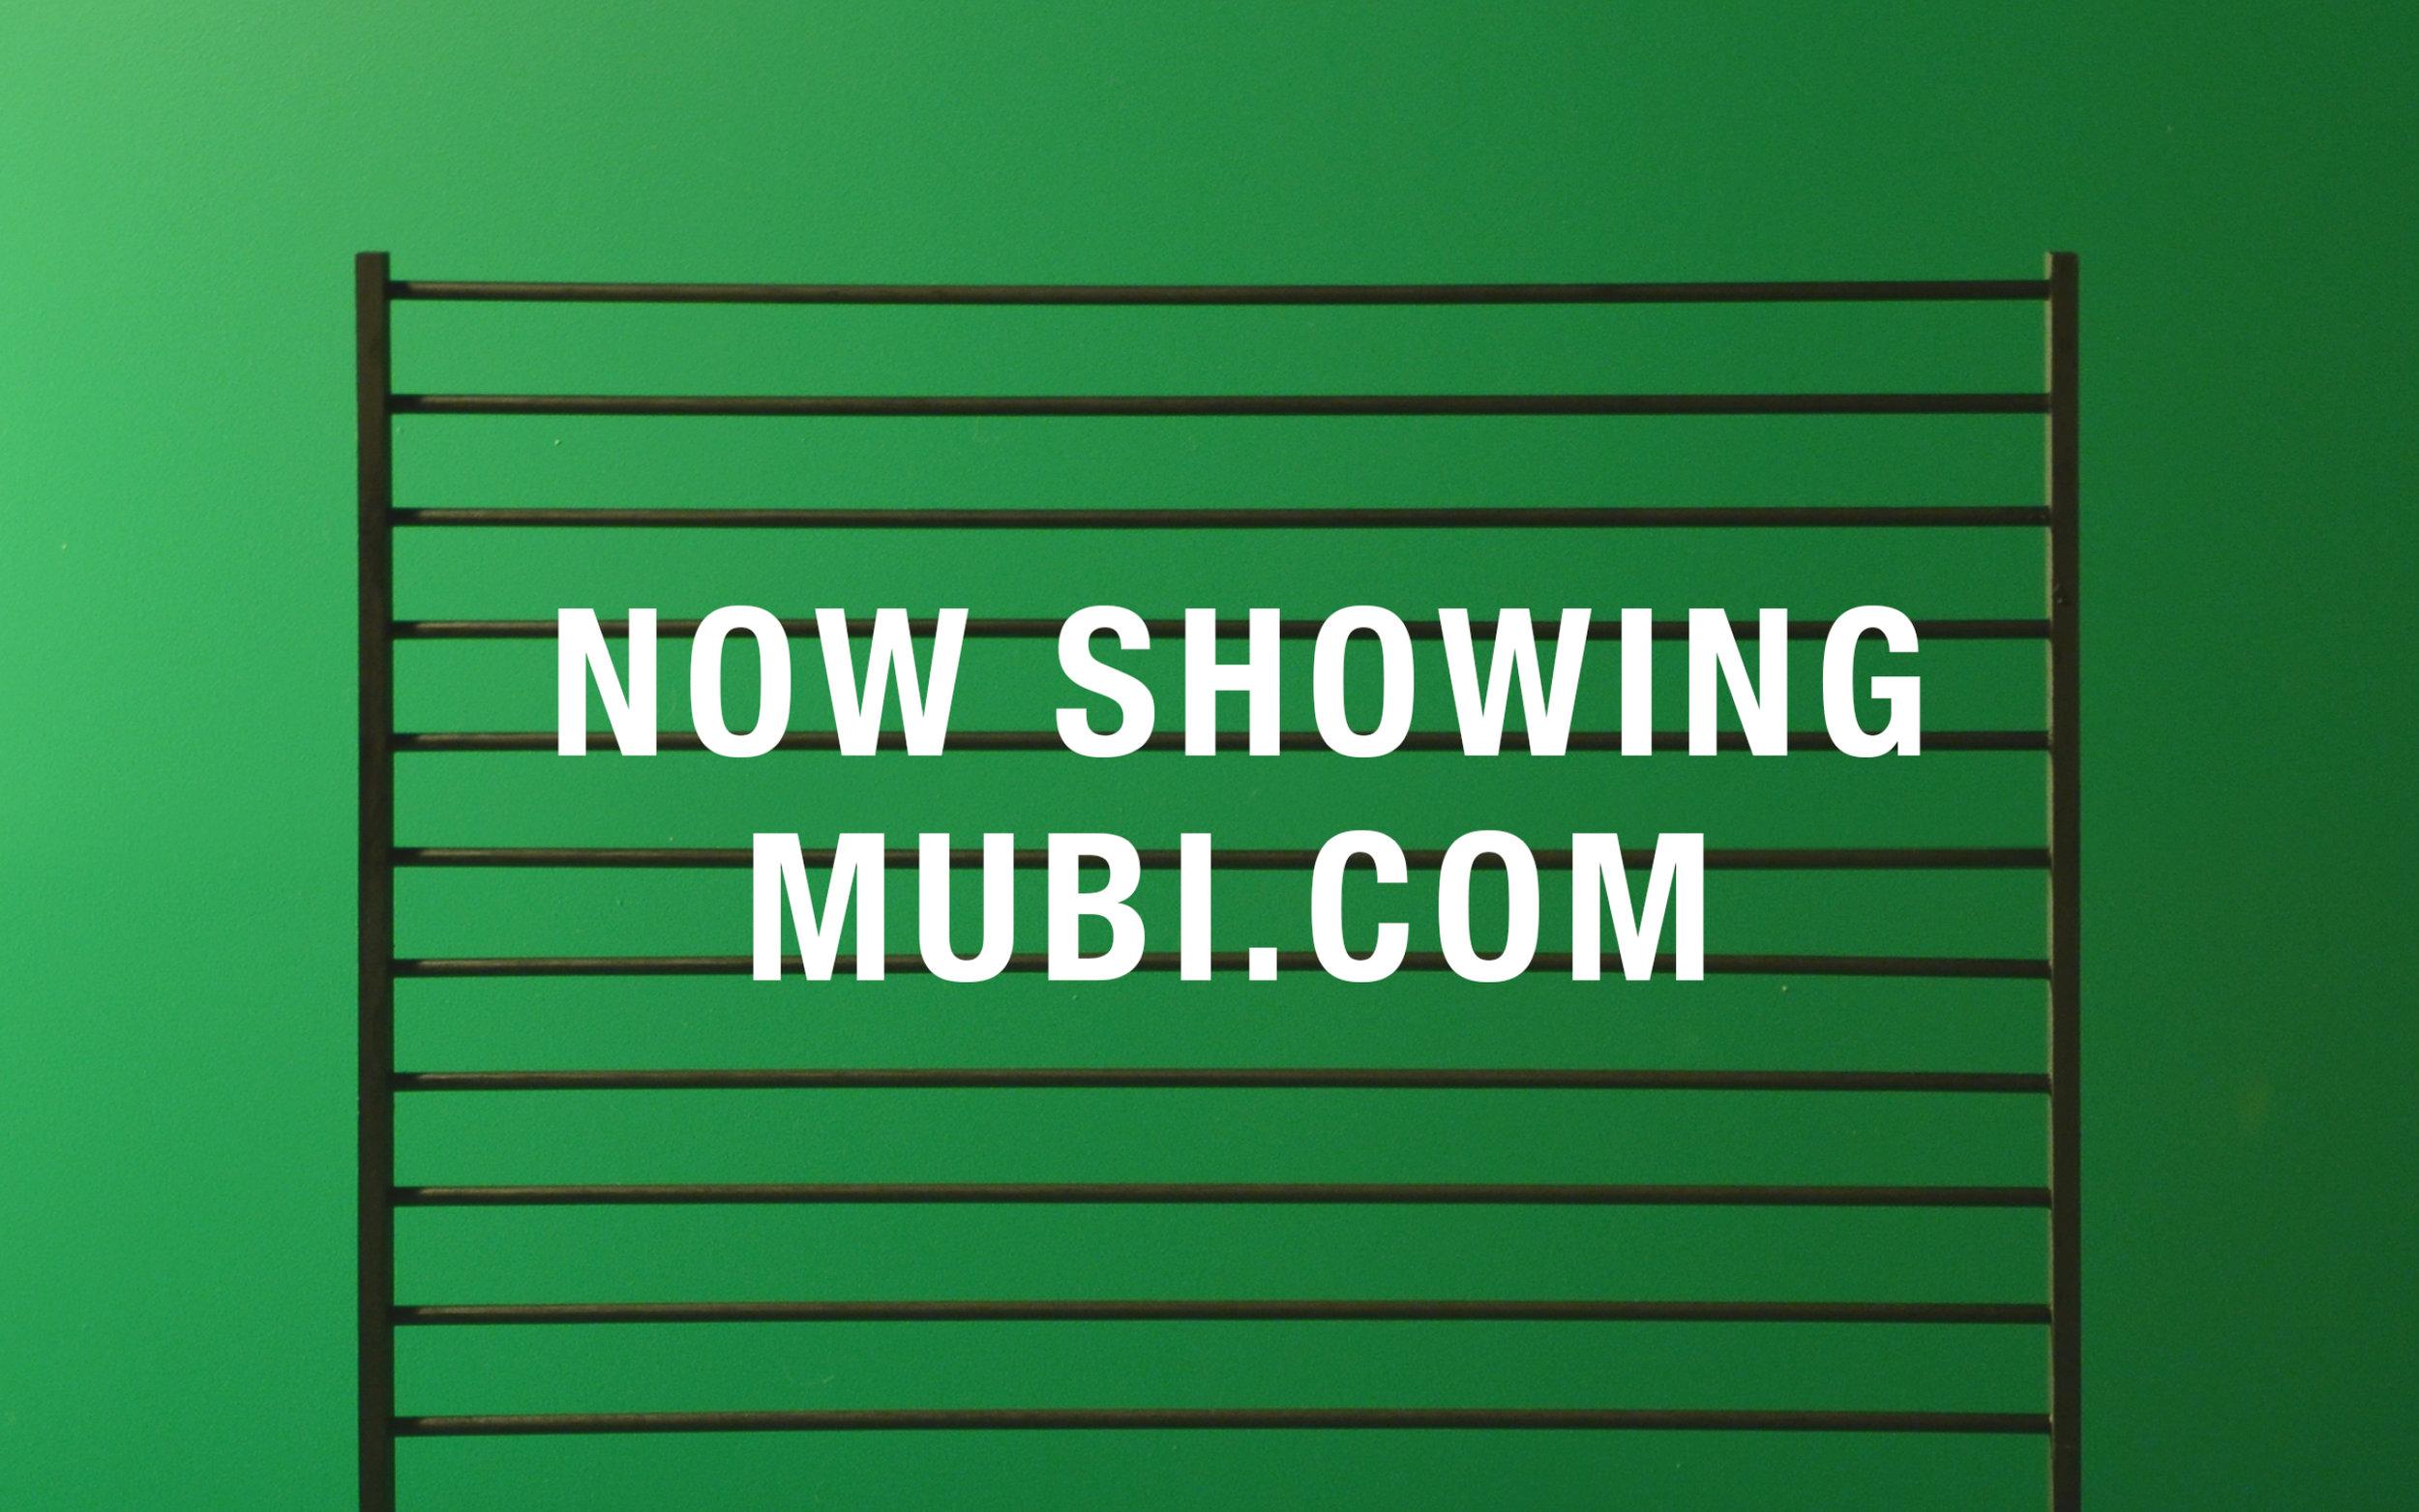 D&AD_Mubi_NowShowing.jpg